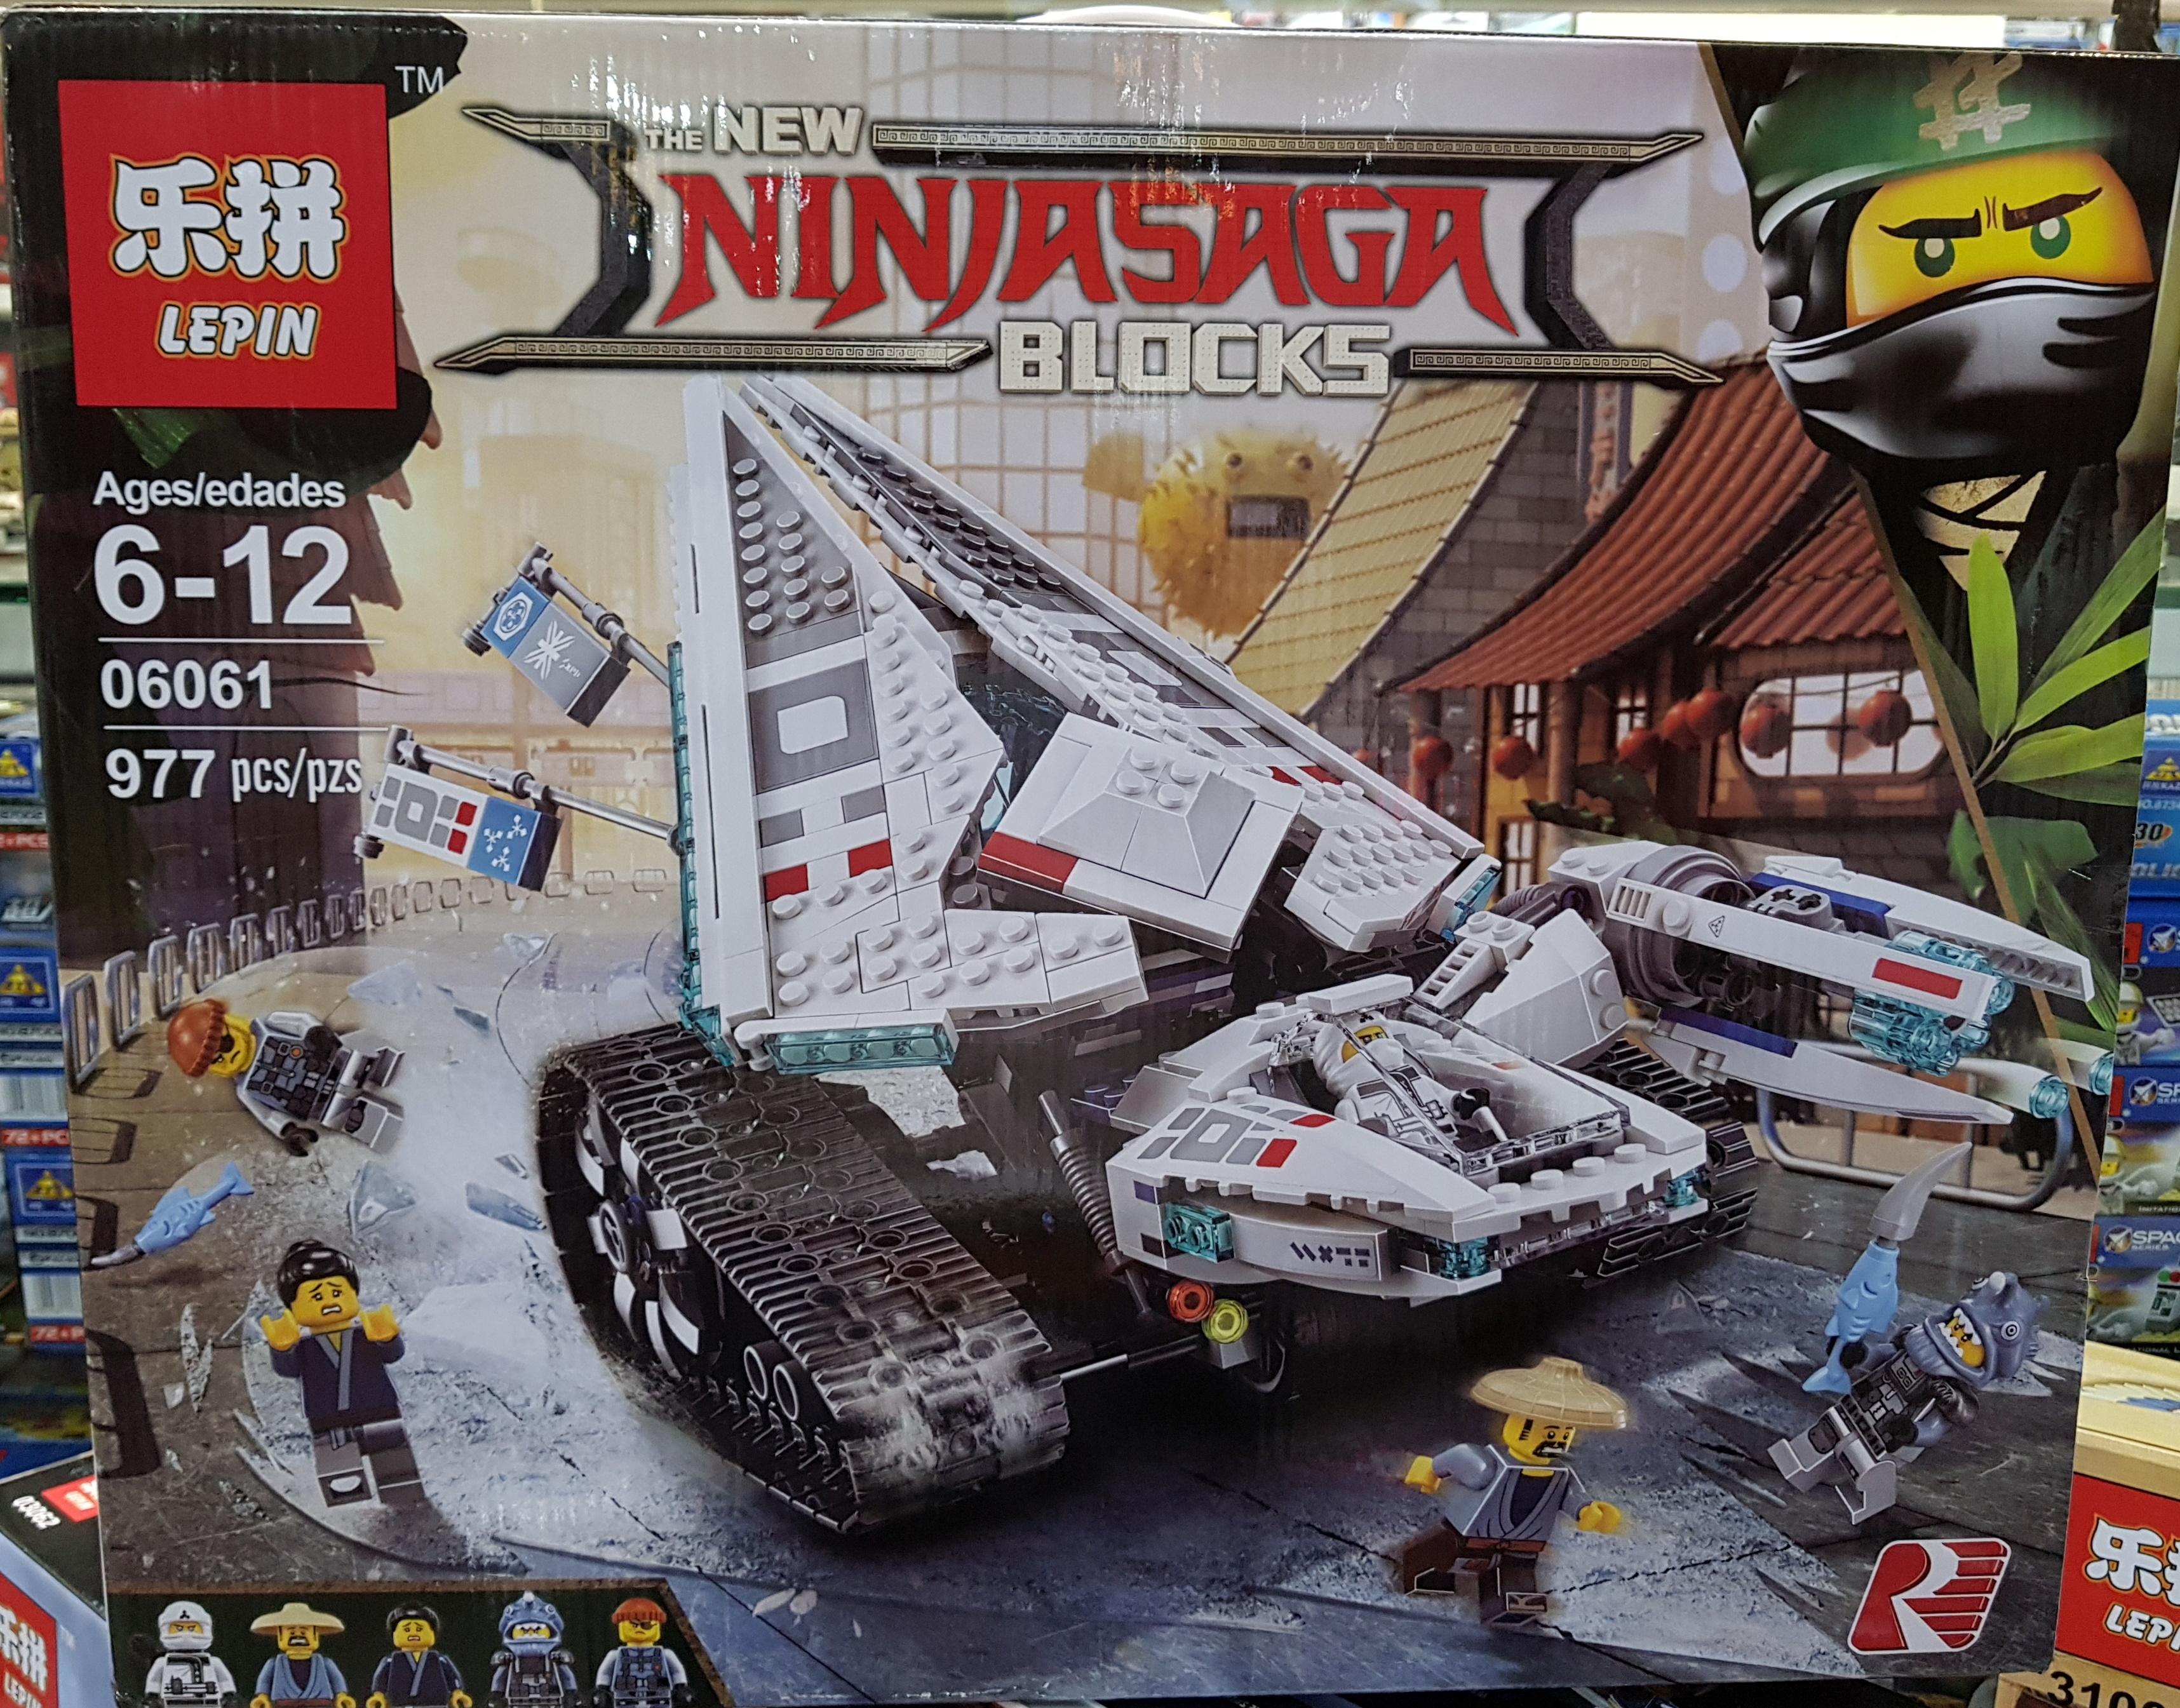 Ninjasaga Ninja Ice Tank 06061 (977ชิ้น)